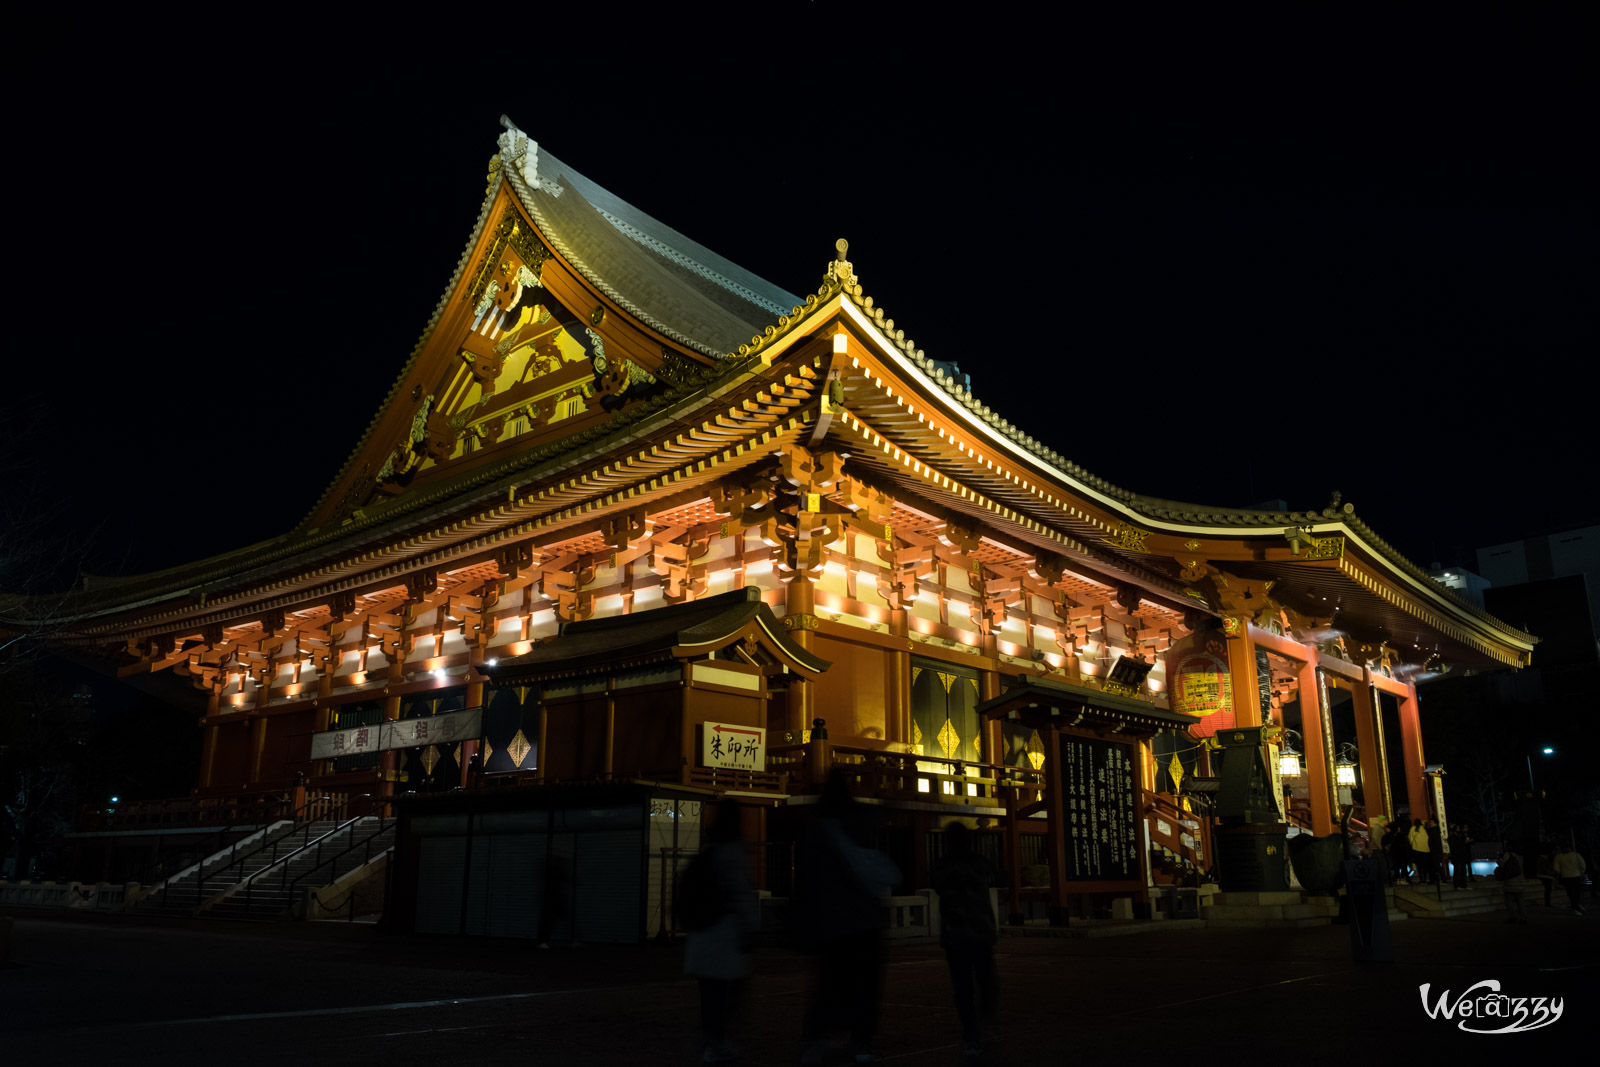 Japon, Tokyo, Voyage, Sensoji, Temple, Nuit